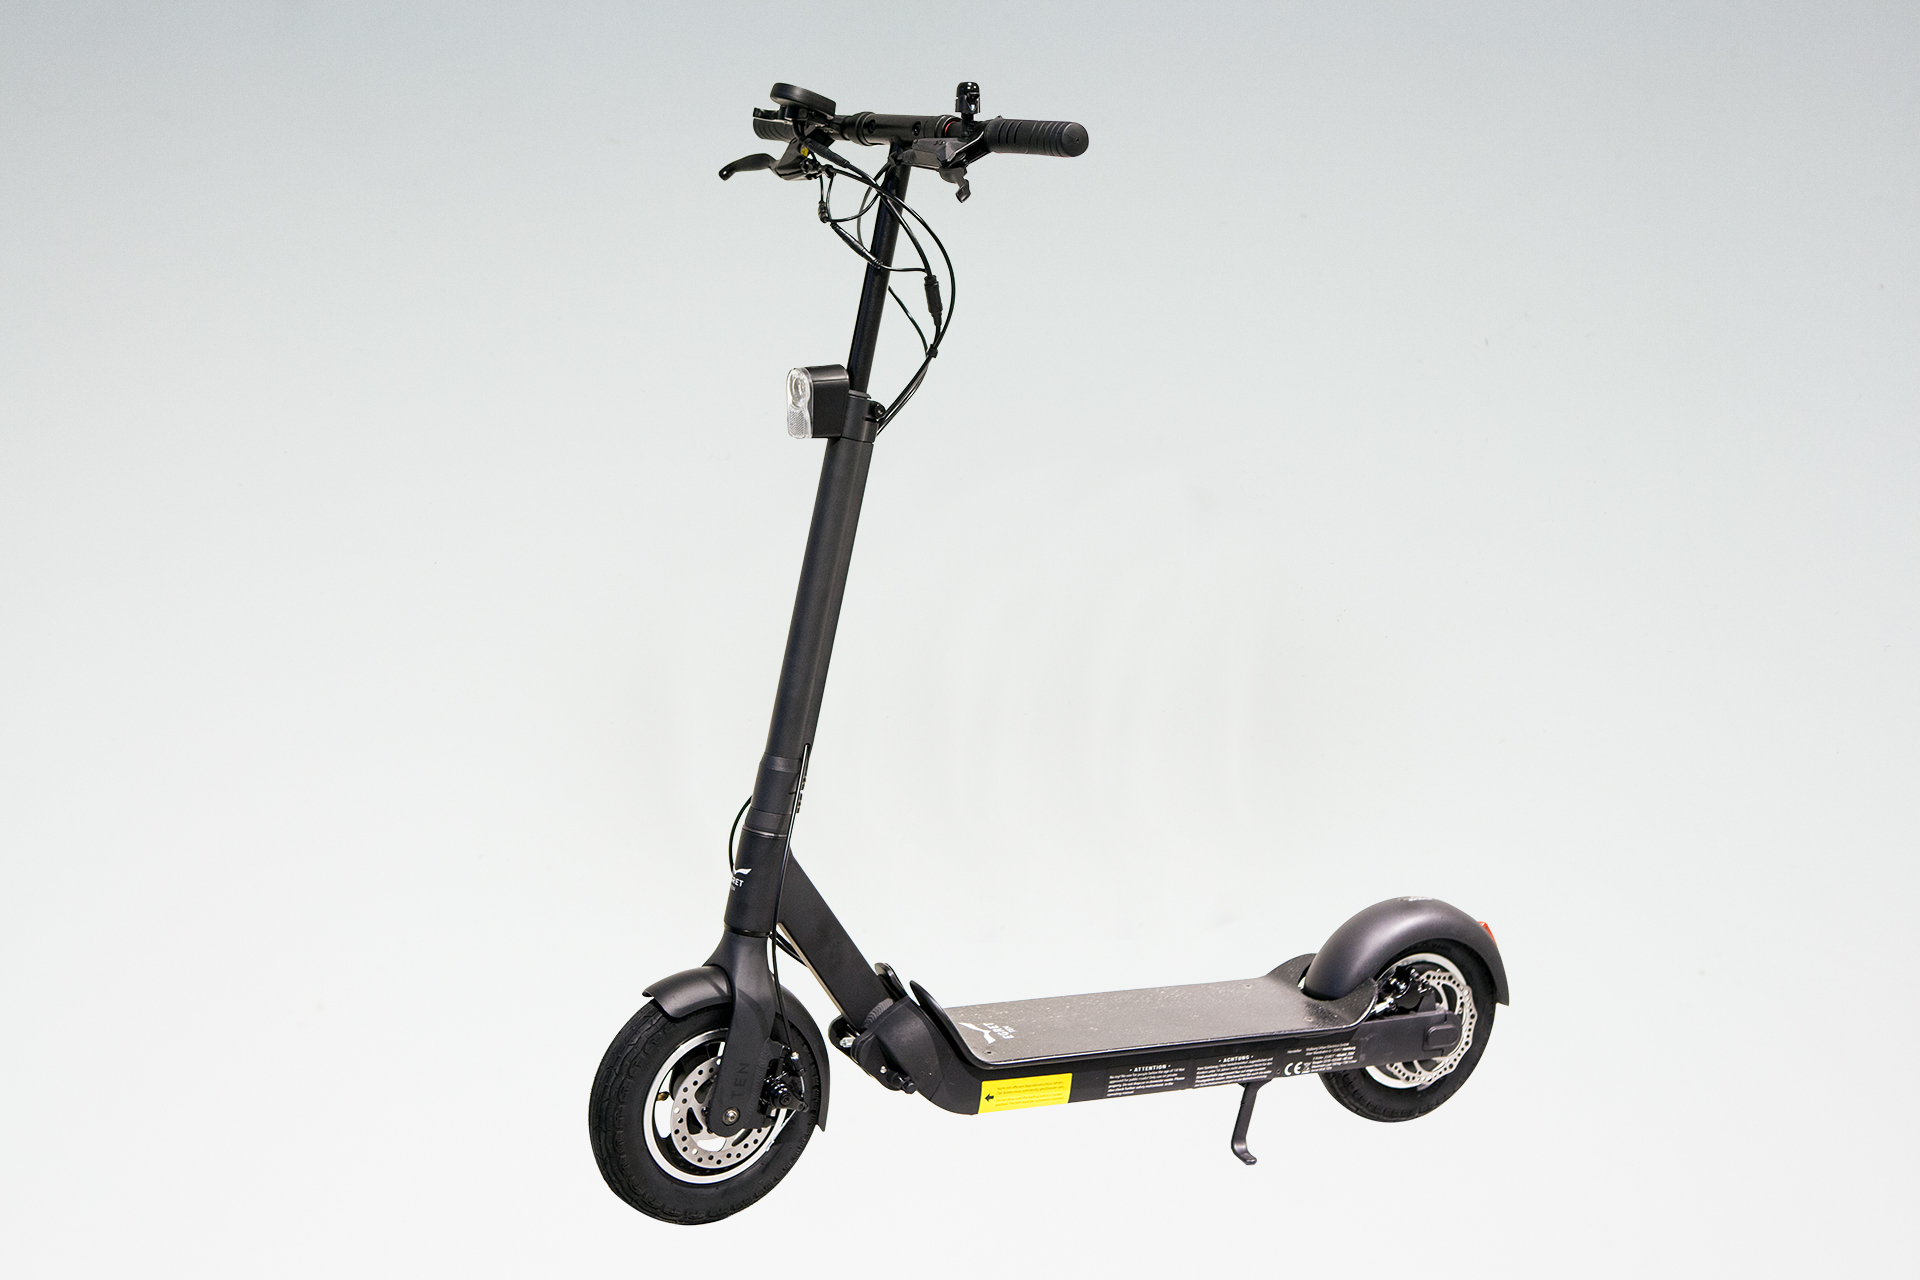 E-Scooter EGRET TEN V4, 48V mit Zulassung, aktuellste Version